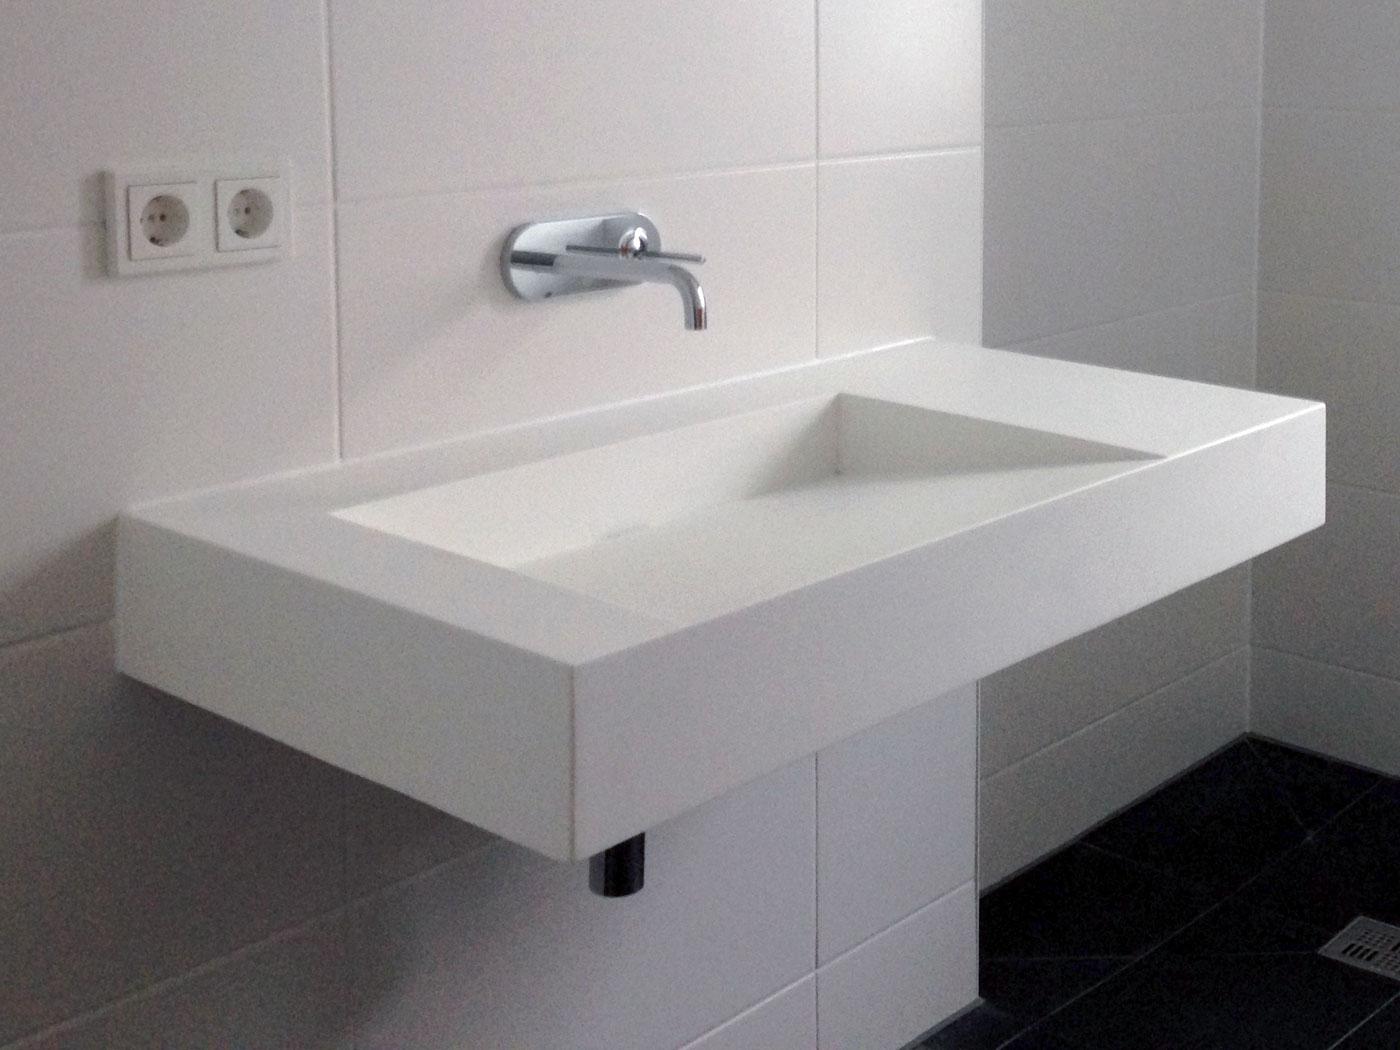 Wall Mounted Trough Sink  WT04B Right Side  Badeloft USA